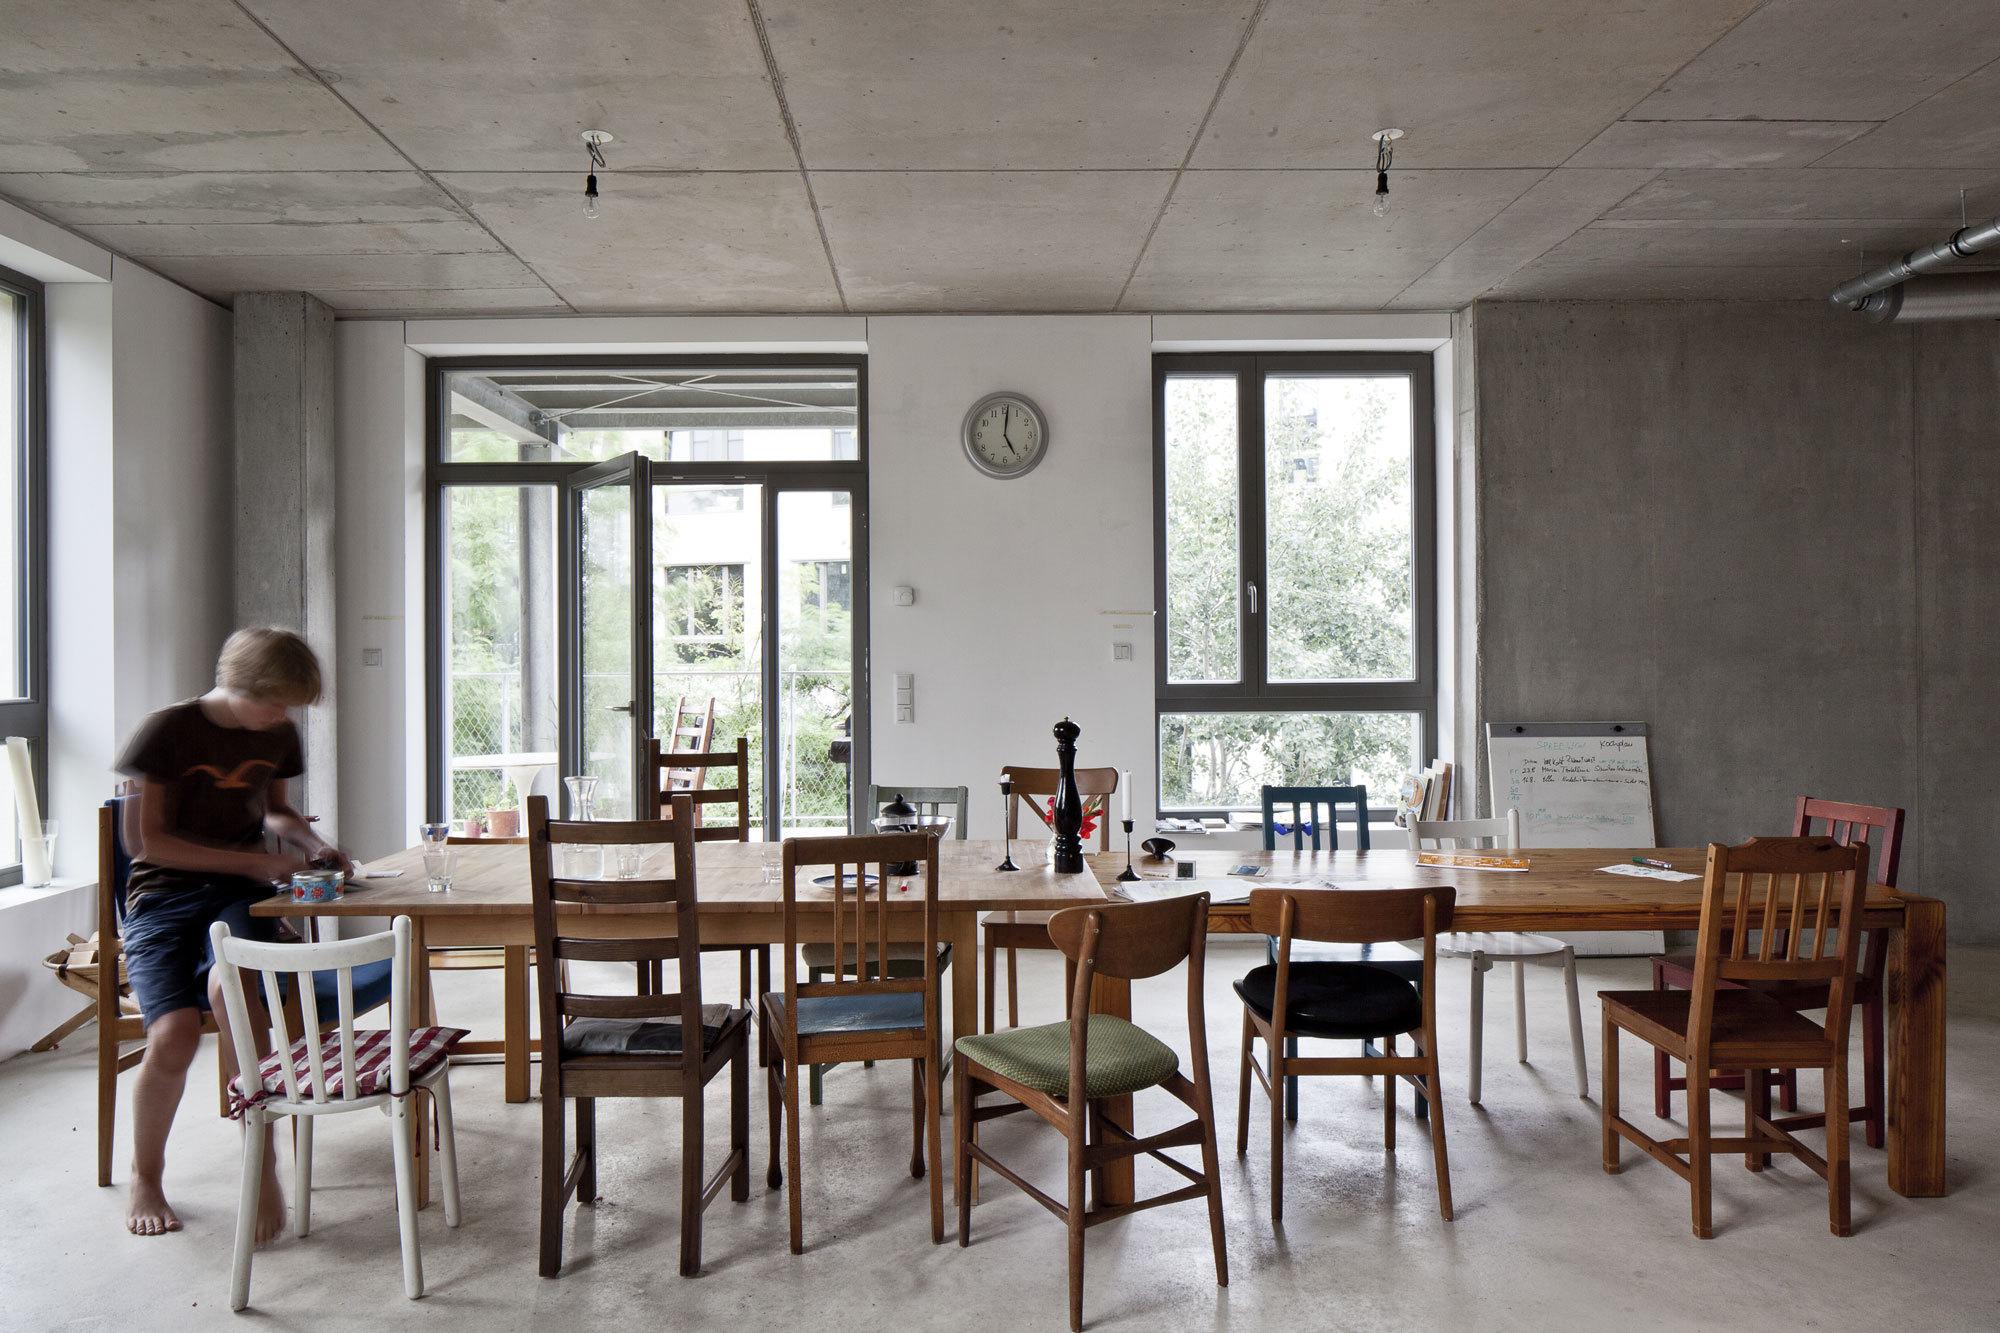 Spreefeld, Berlin, Carpaneto Schöningh Architekten, fatkoehl architekten, BARarchitekten, 2014, Foto: Ute Zscharnt